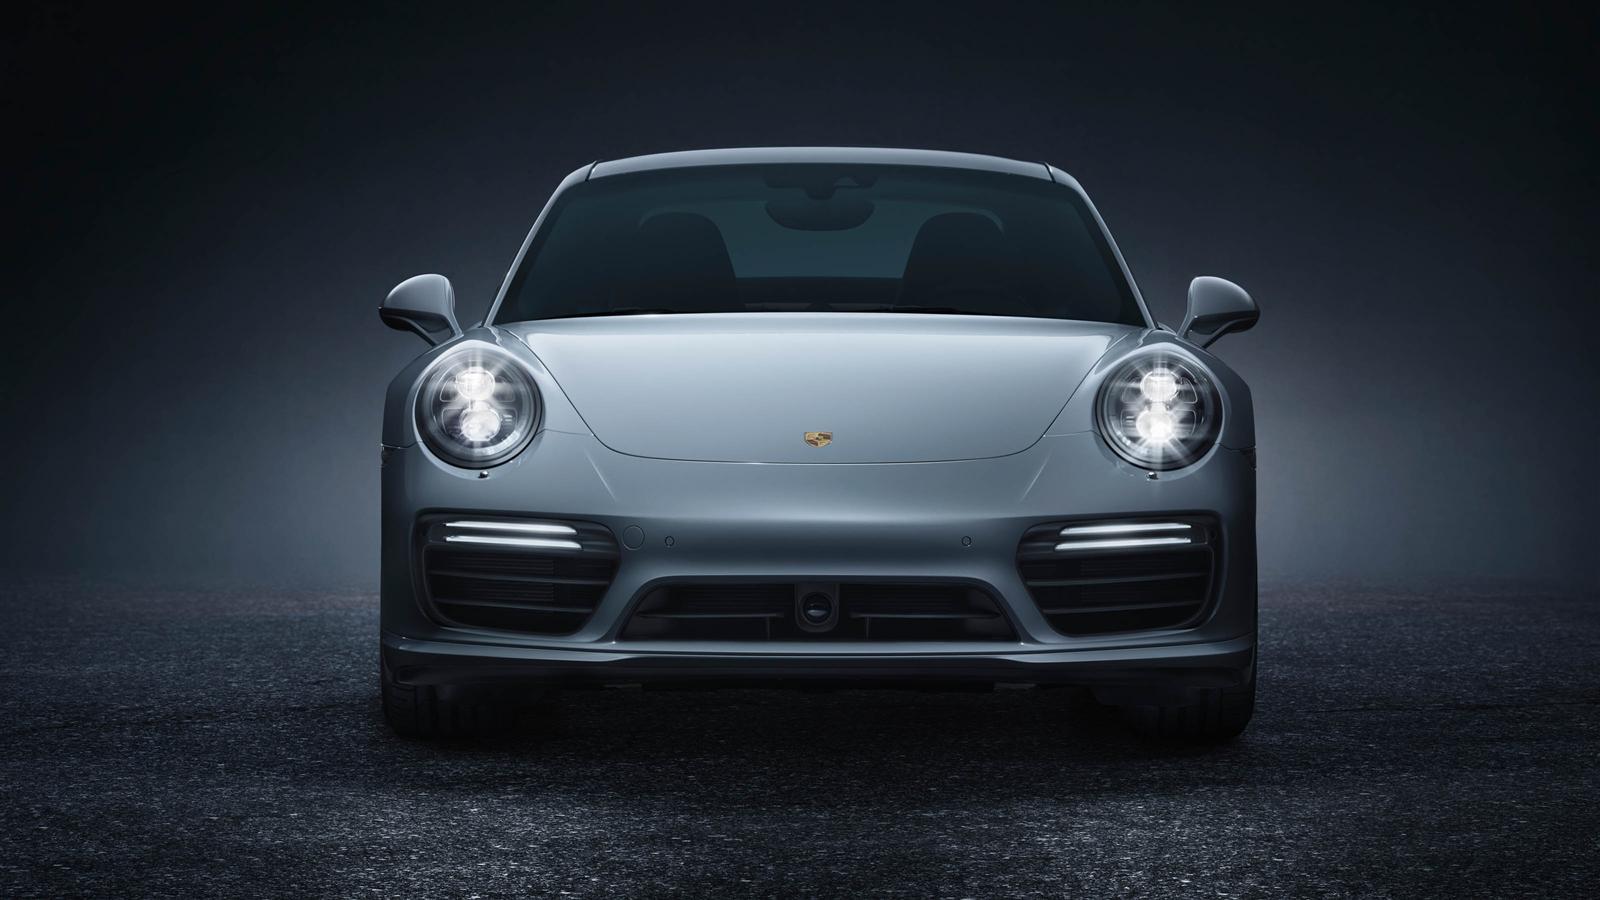 Porsche 911 Turbo S >> PORSCHE 911 Turbo S (991.2) specs & photos - 2016, 2017, 2018, 2019 - autoevolution